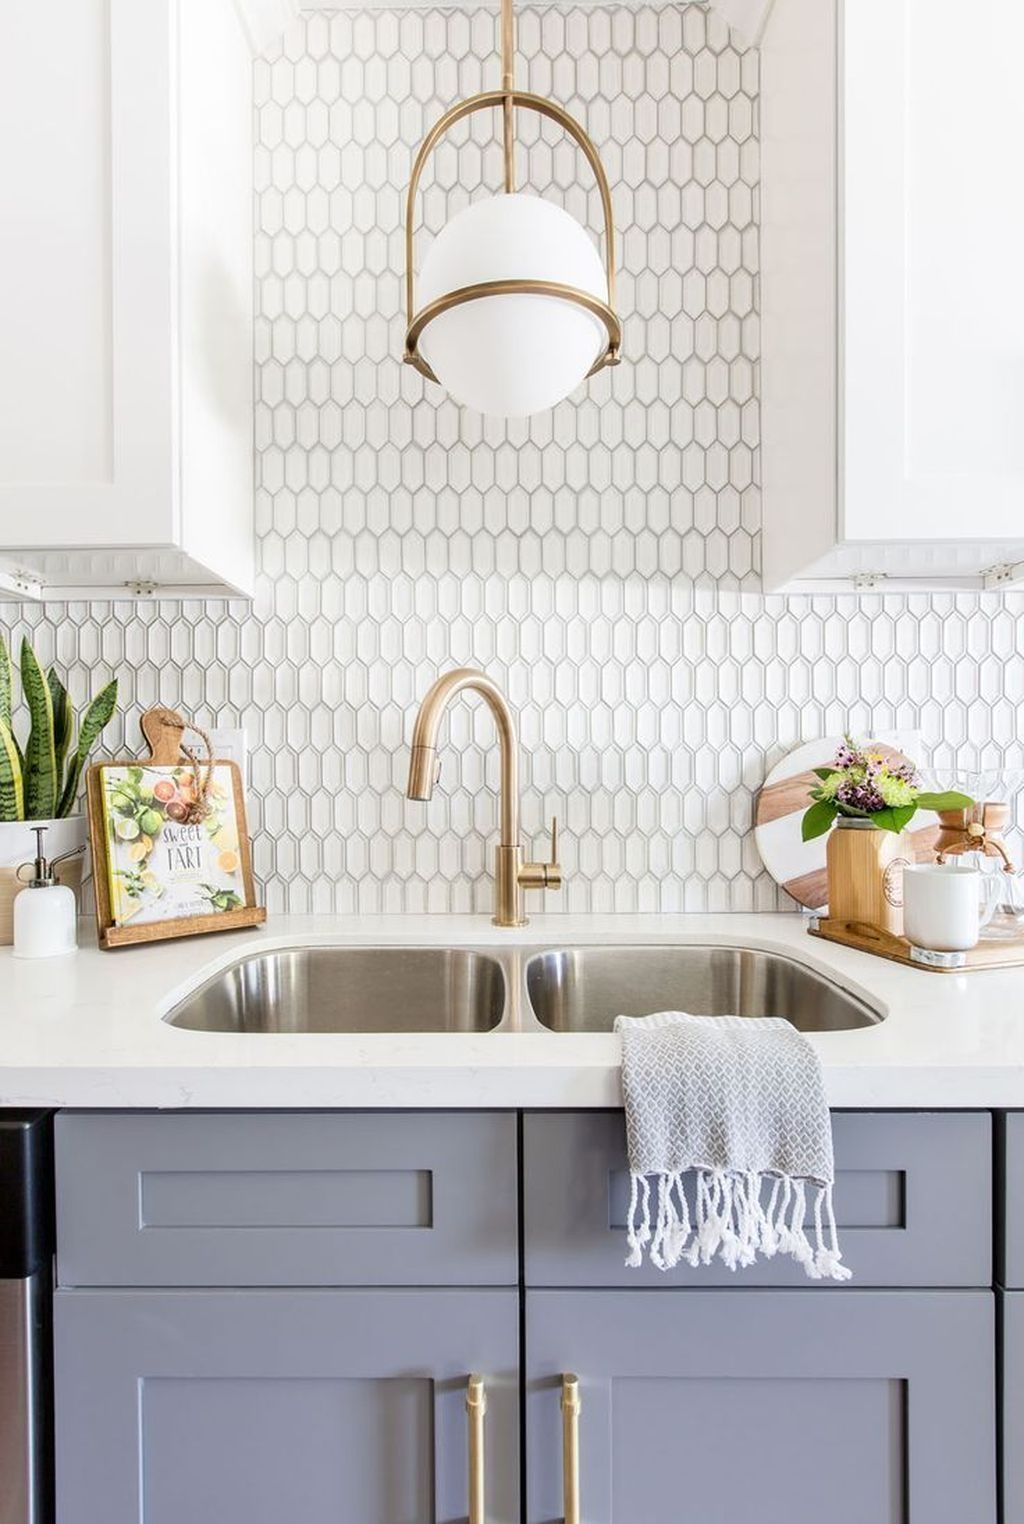 37 creative kitchen backsplash decor ideas with images on kitchen ideas unique id=63620